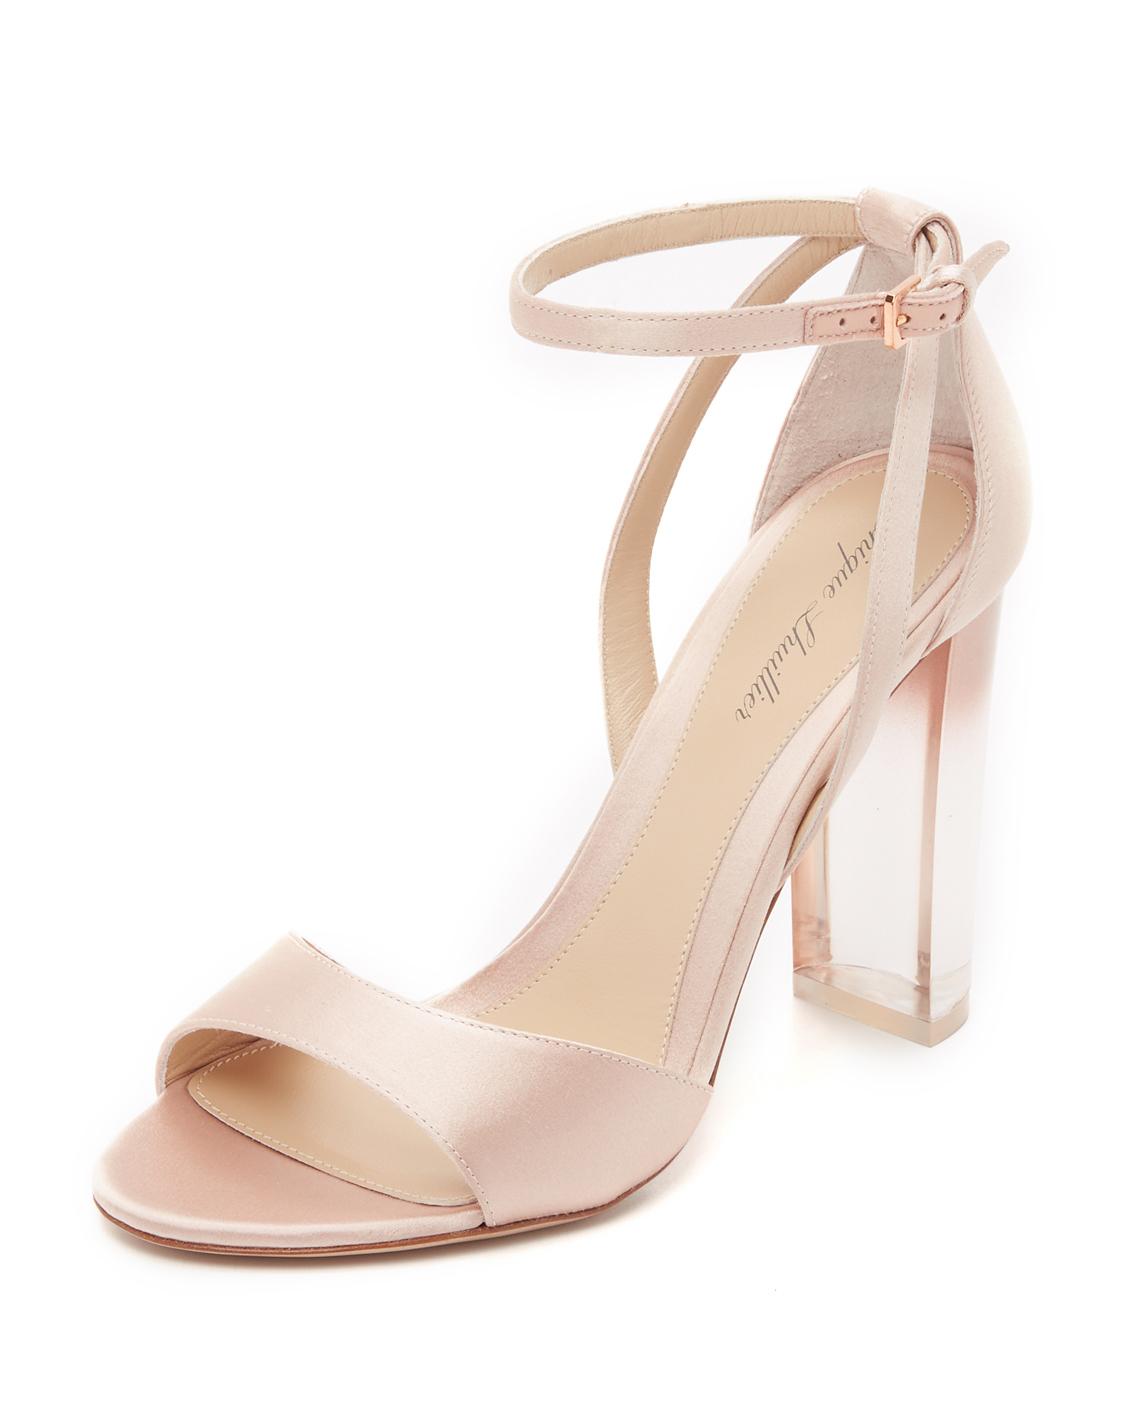 outdoor-wedding-outfit-monique-lhuillier-heels-0616.jpg